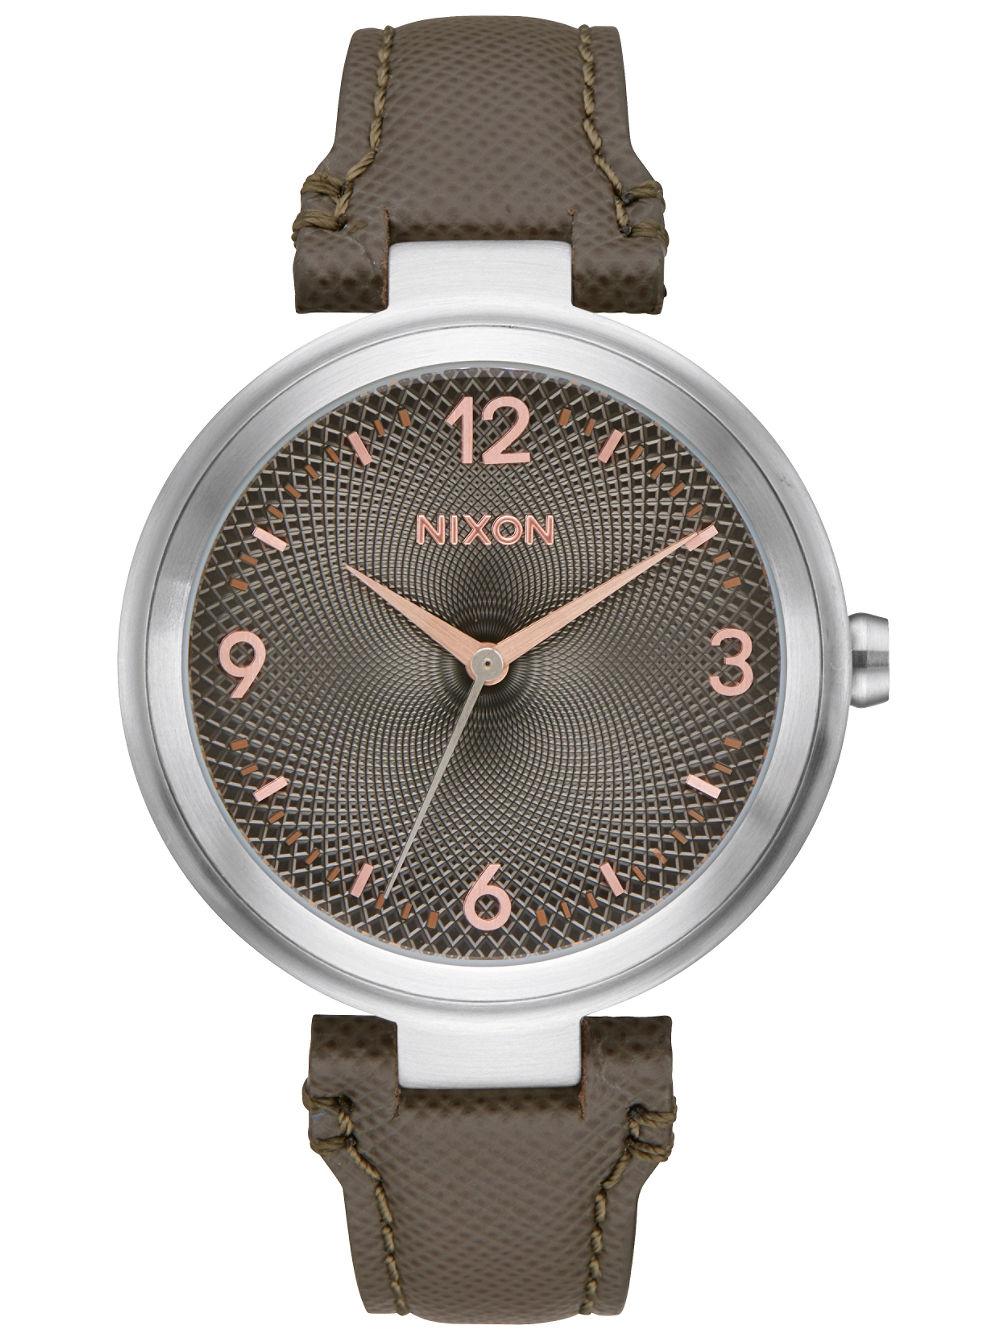 nixon-the-chameleon-leather